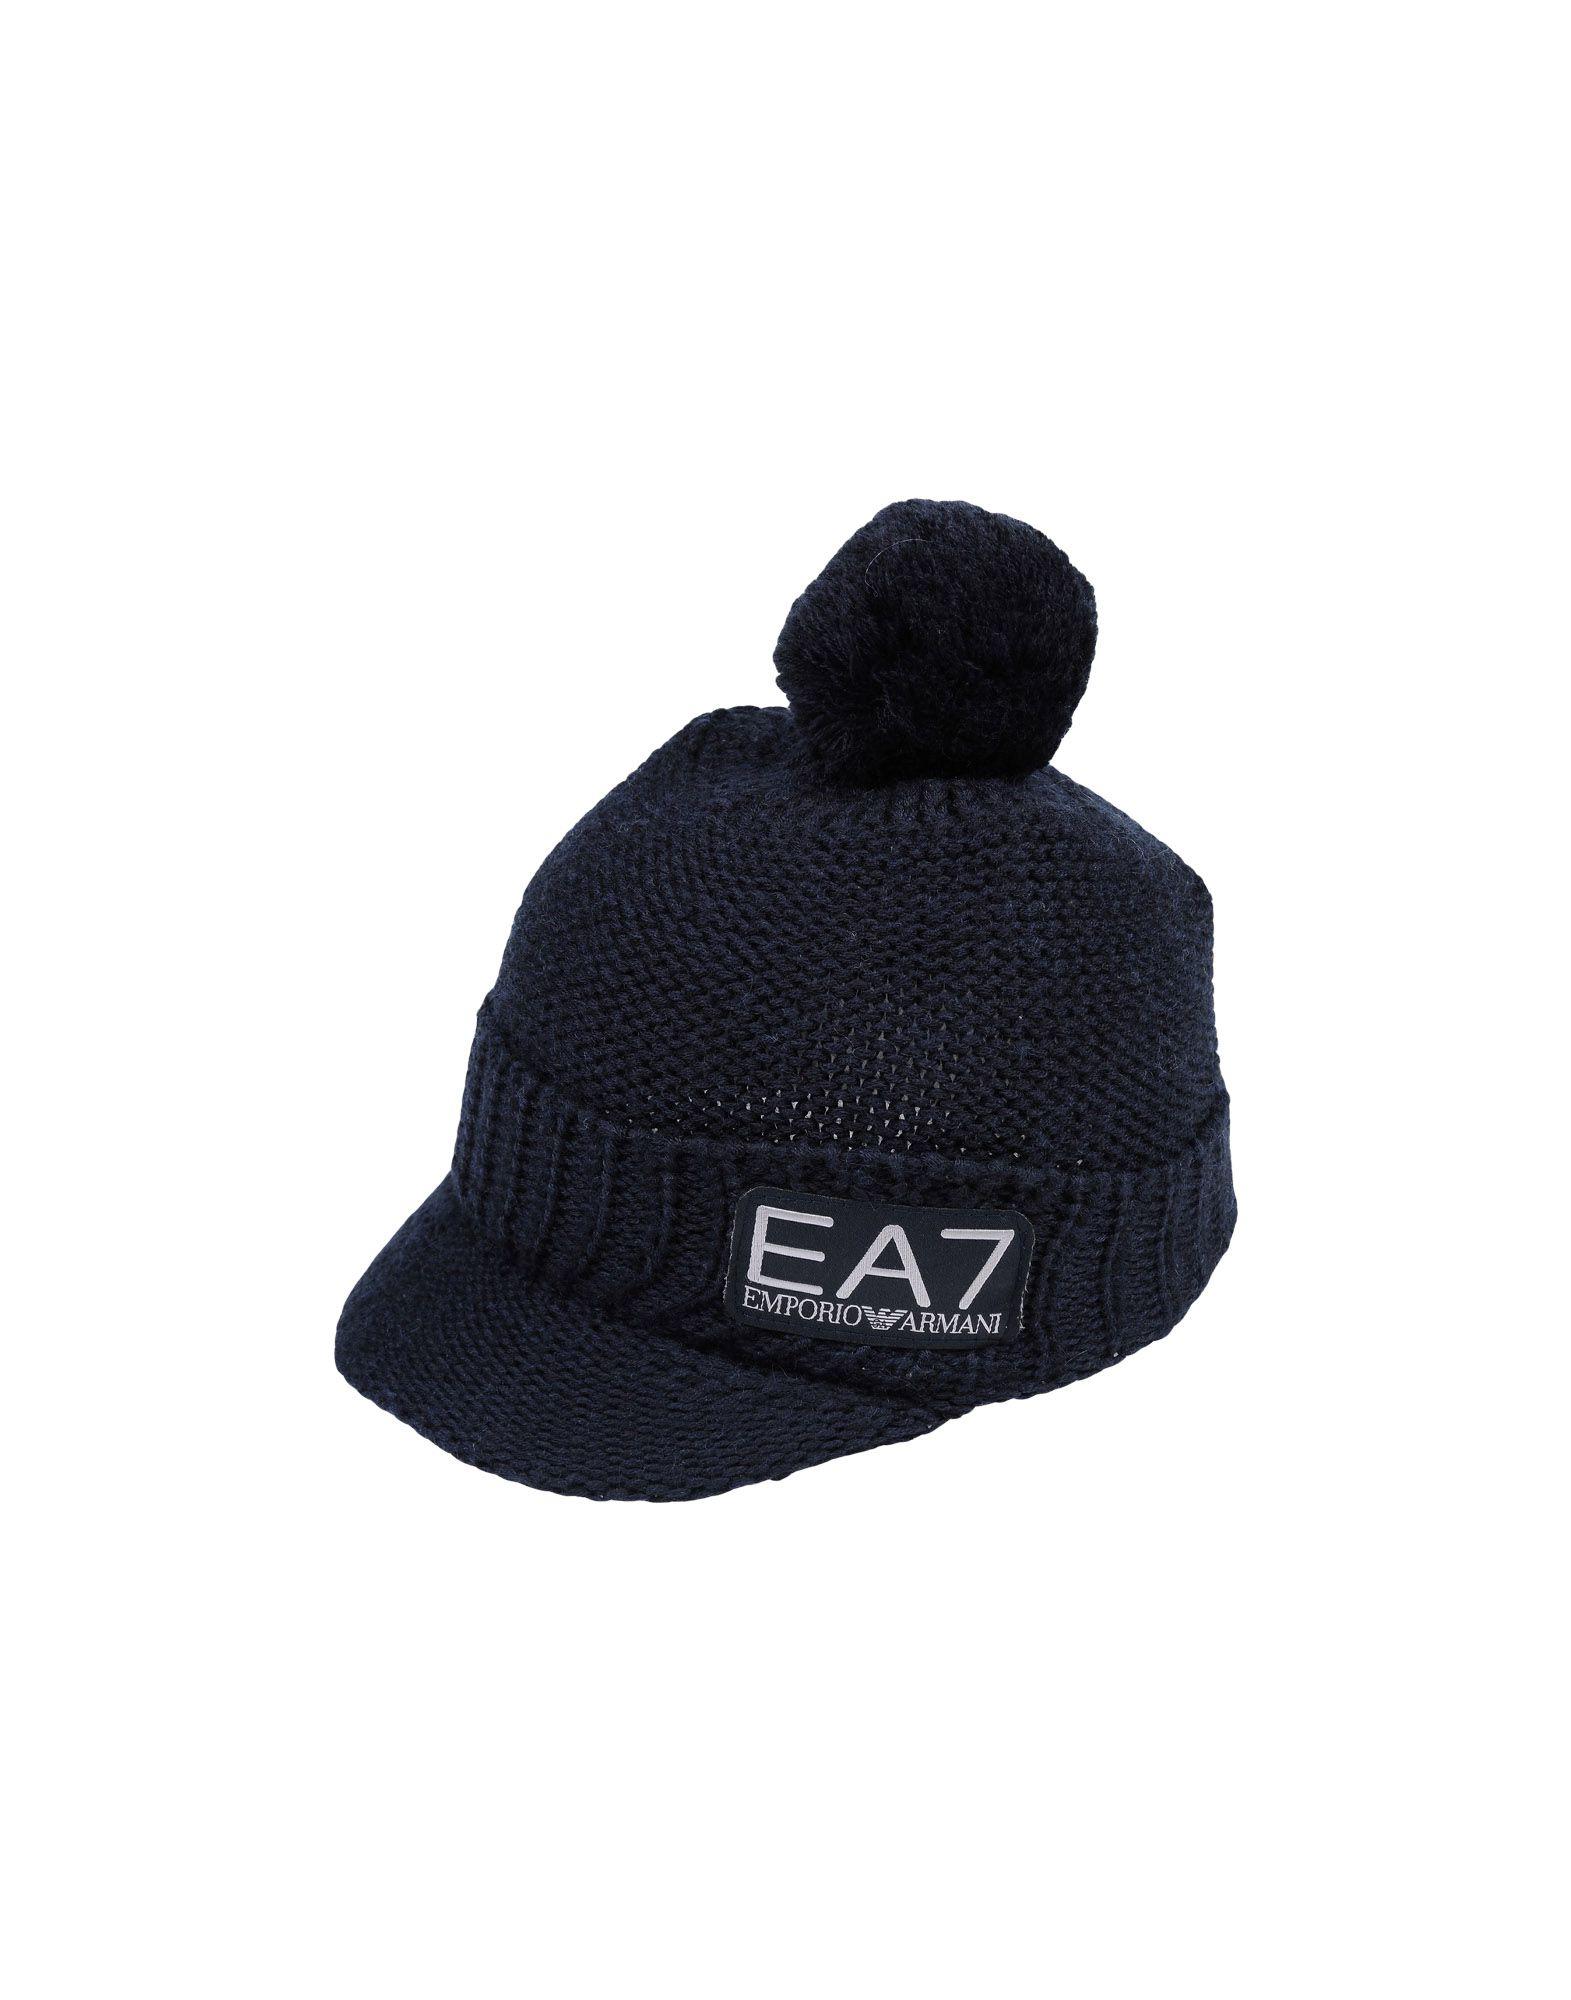 EA7 Головной убор головной убор armani 2755145p 297100074 emporio ea7 2755145p297